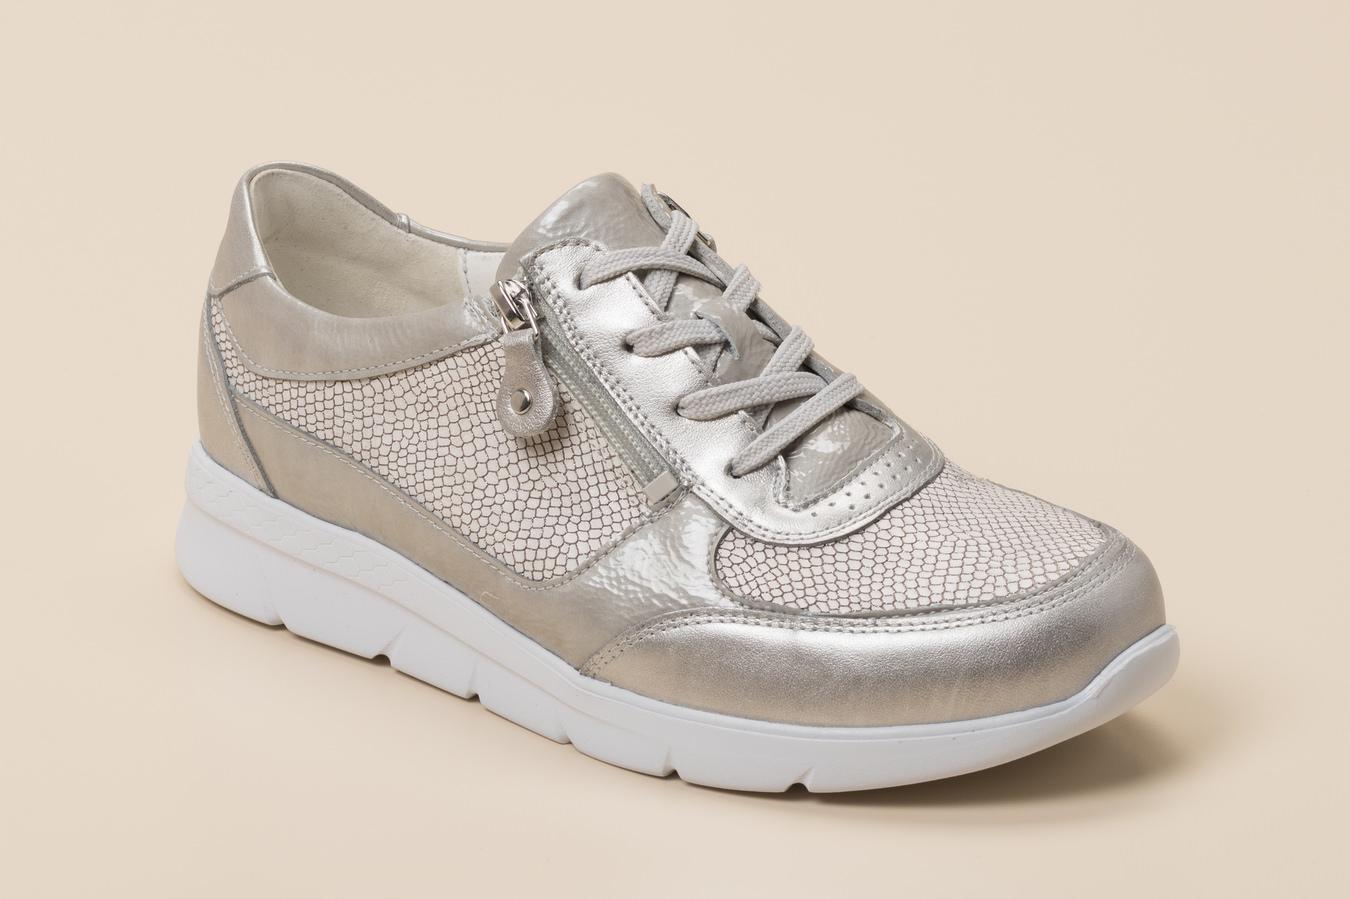 17128b5d649d Waldläufer Damen Sneaker in silber kaufen | Zumnorde Online-Shop